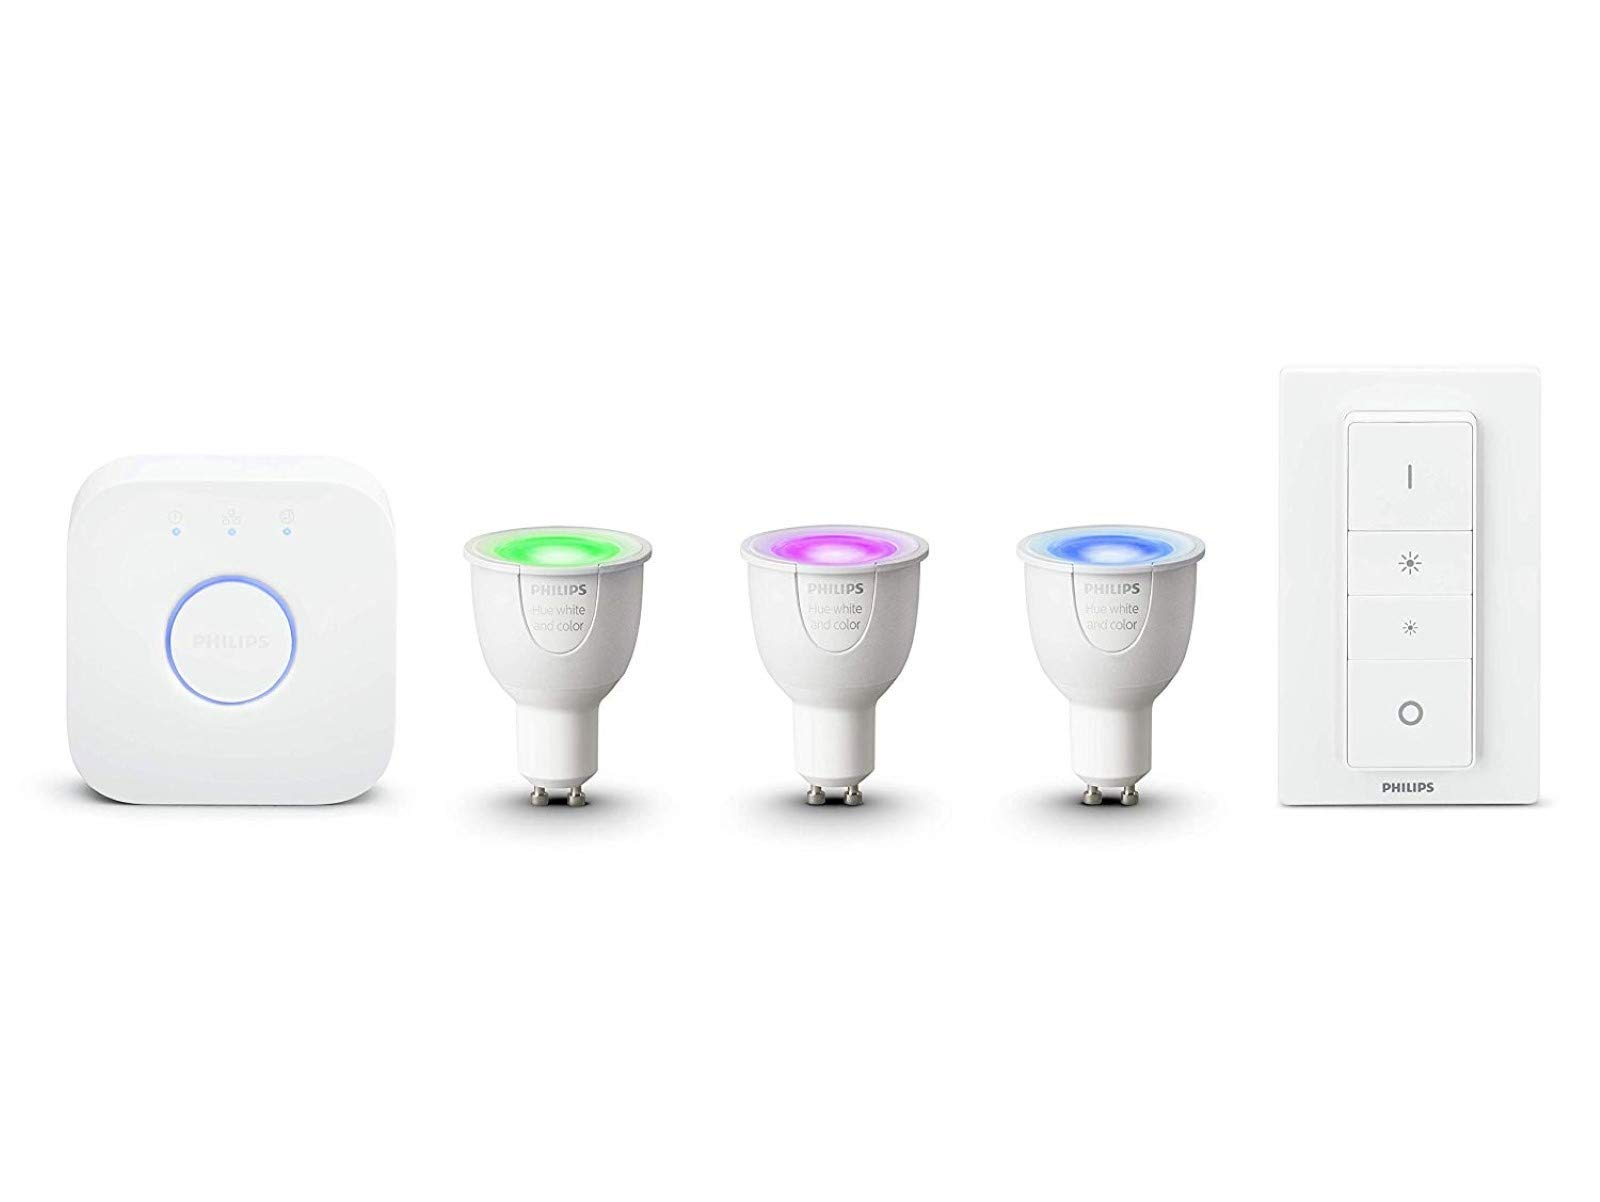 Philips Hue White und Color Ambiance GU10 LED Lampe Starter Set, drei Lampen, dimmbar, steuerbar via App, kompatibel mit Amazon Alexa (Echo, Echo Dot)